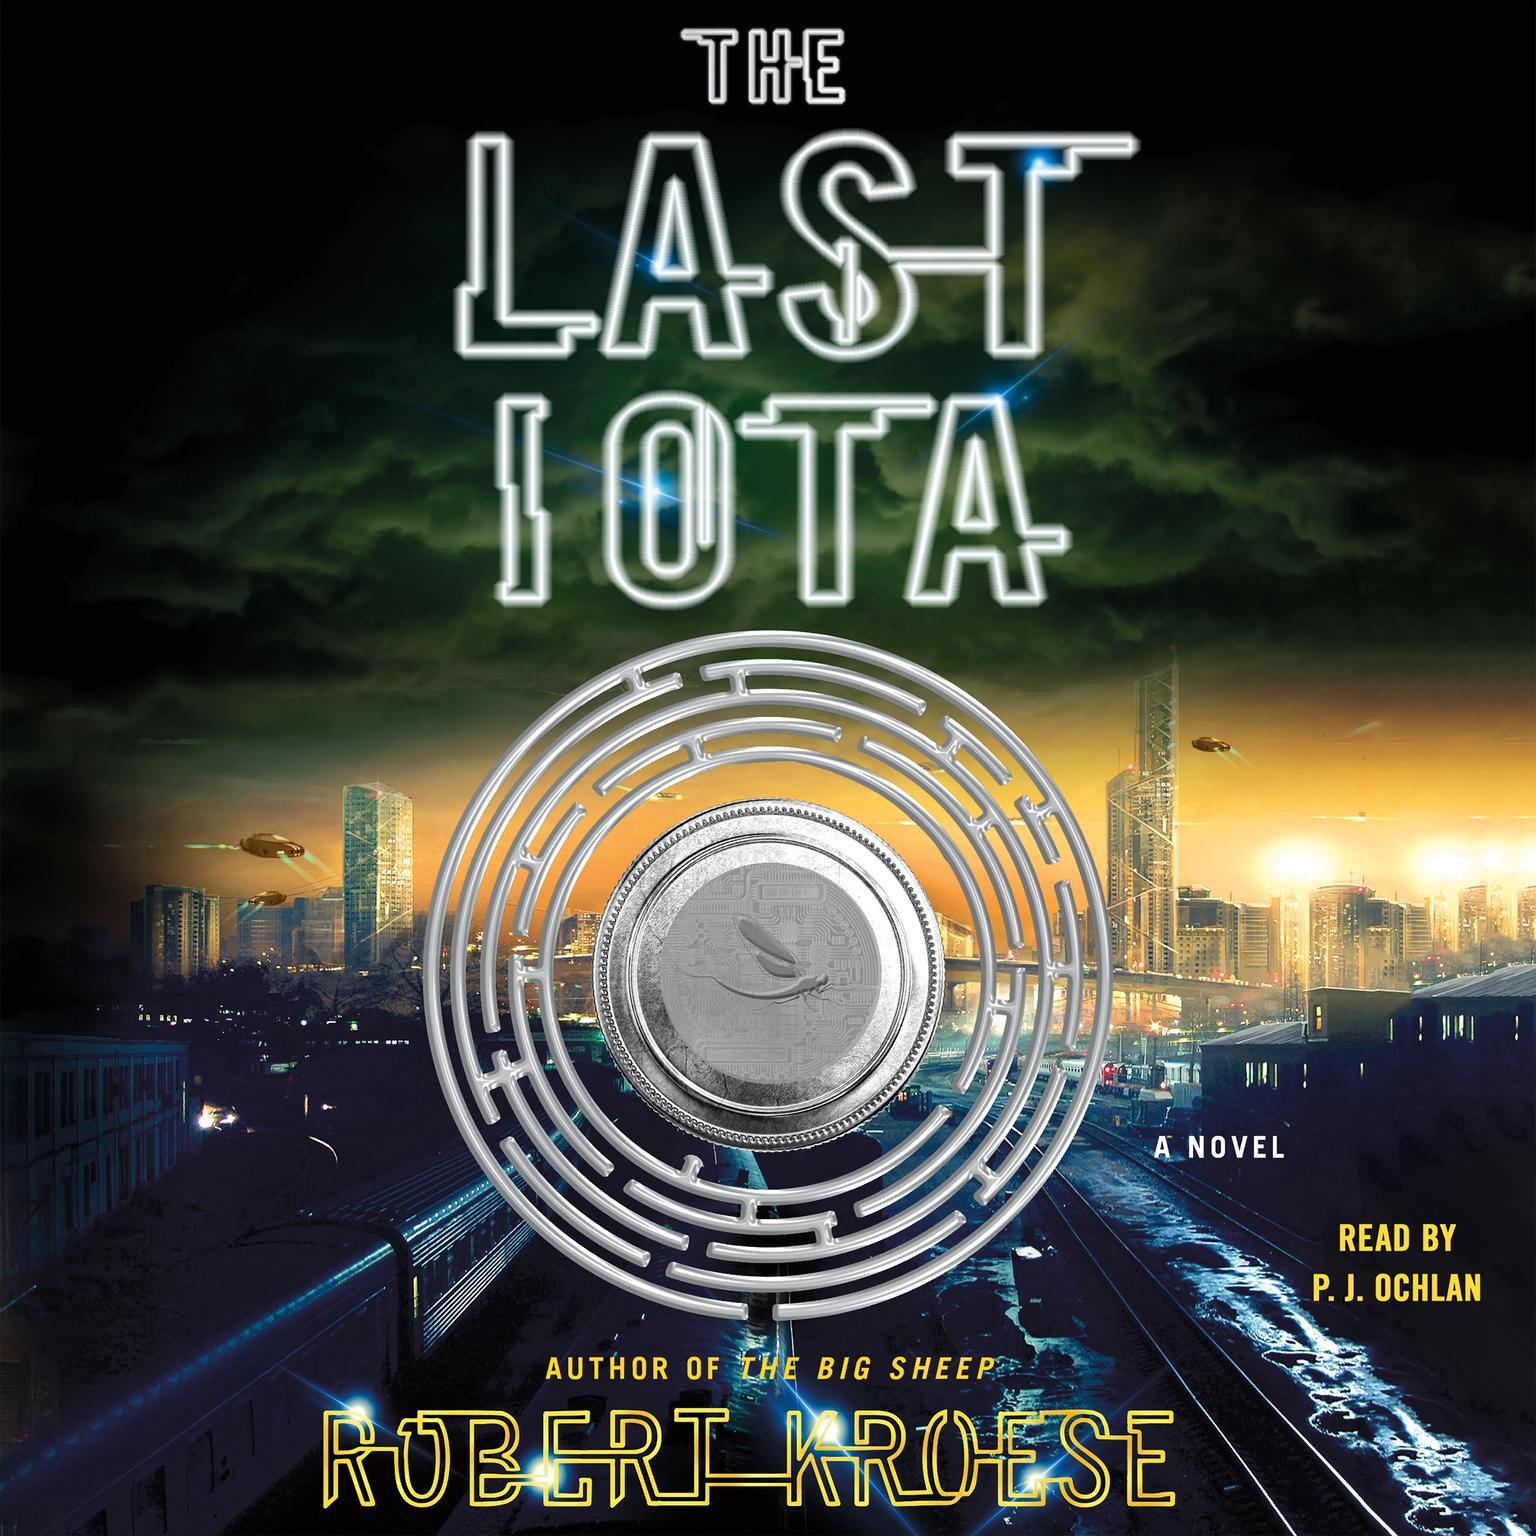 The Last Iota: A Novel Audiobook, by Robert Kroese